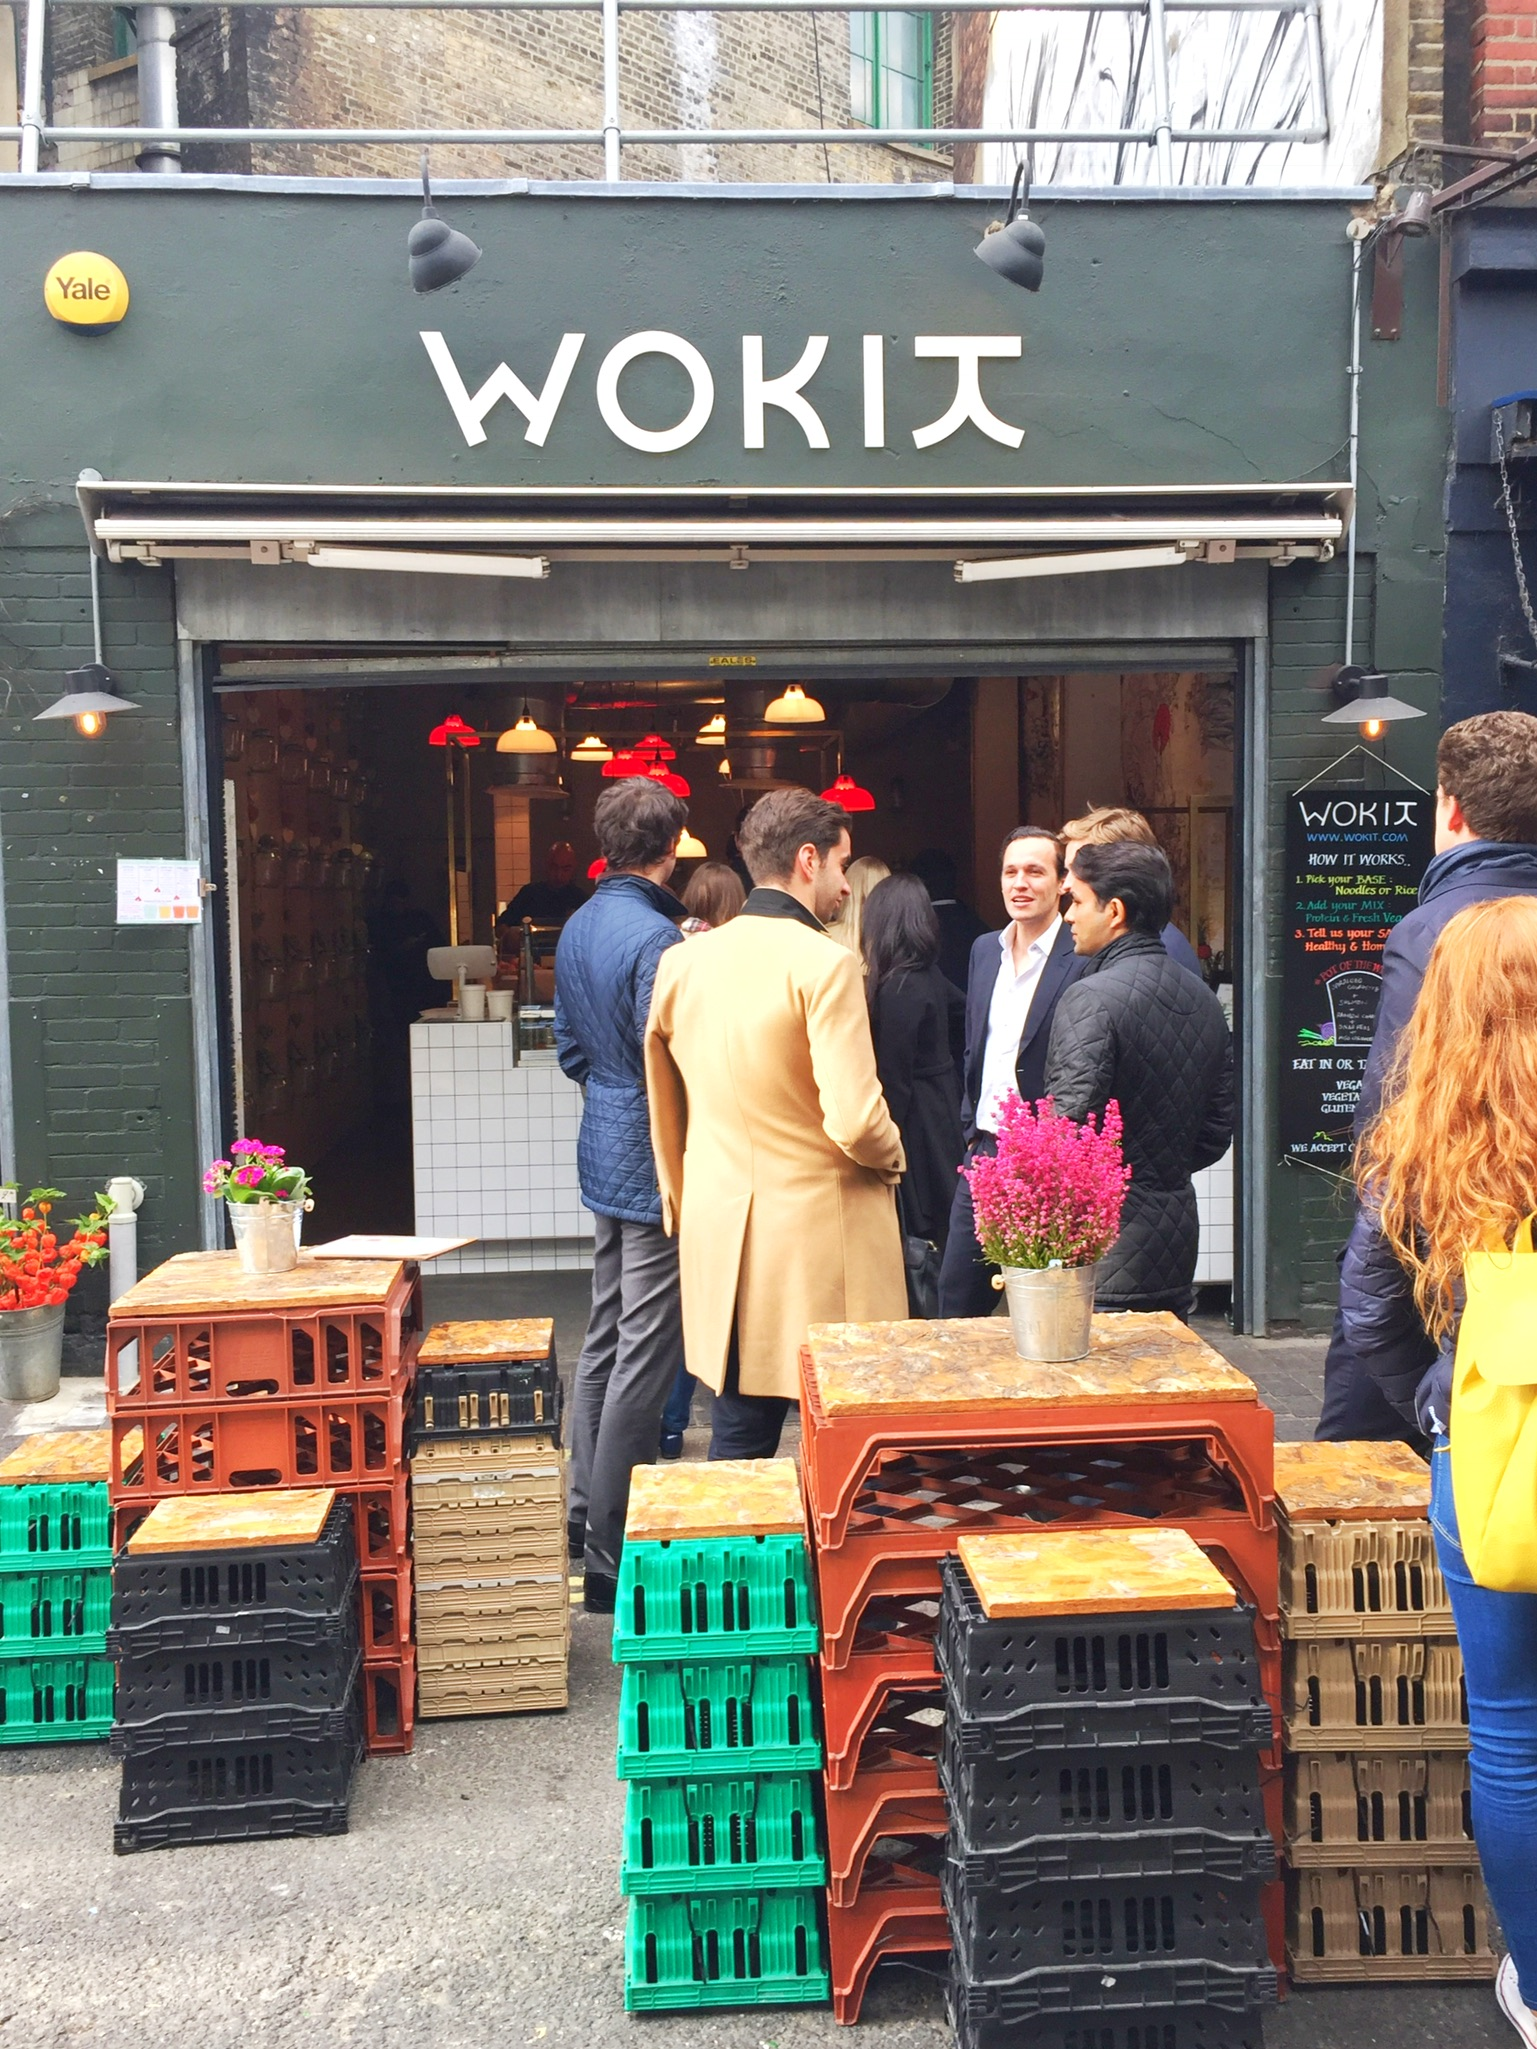 October Discoveries Urban kristy London Wokit